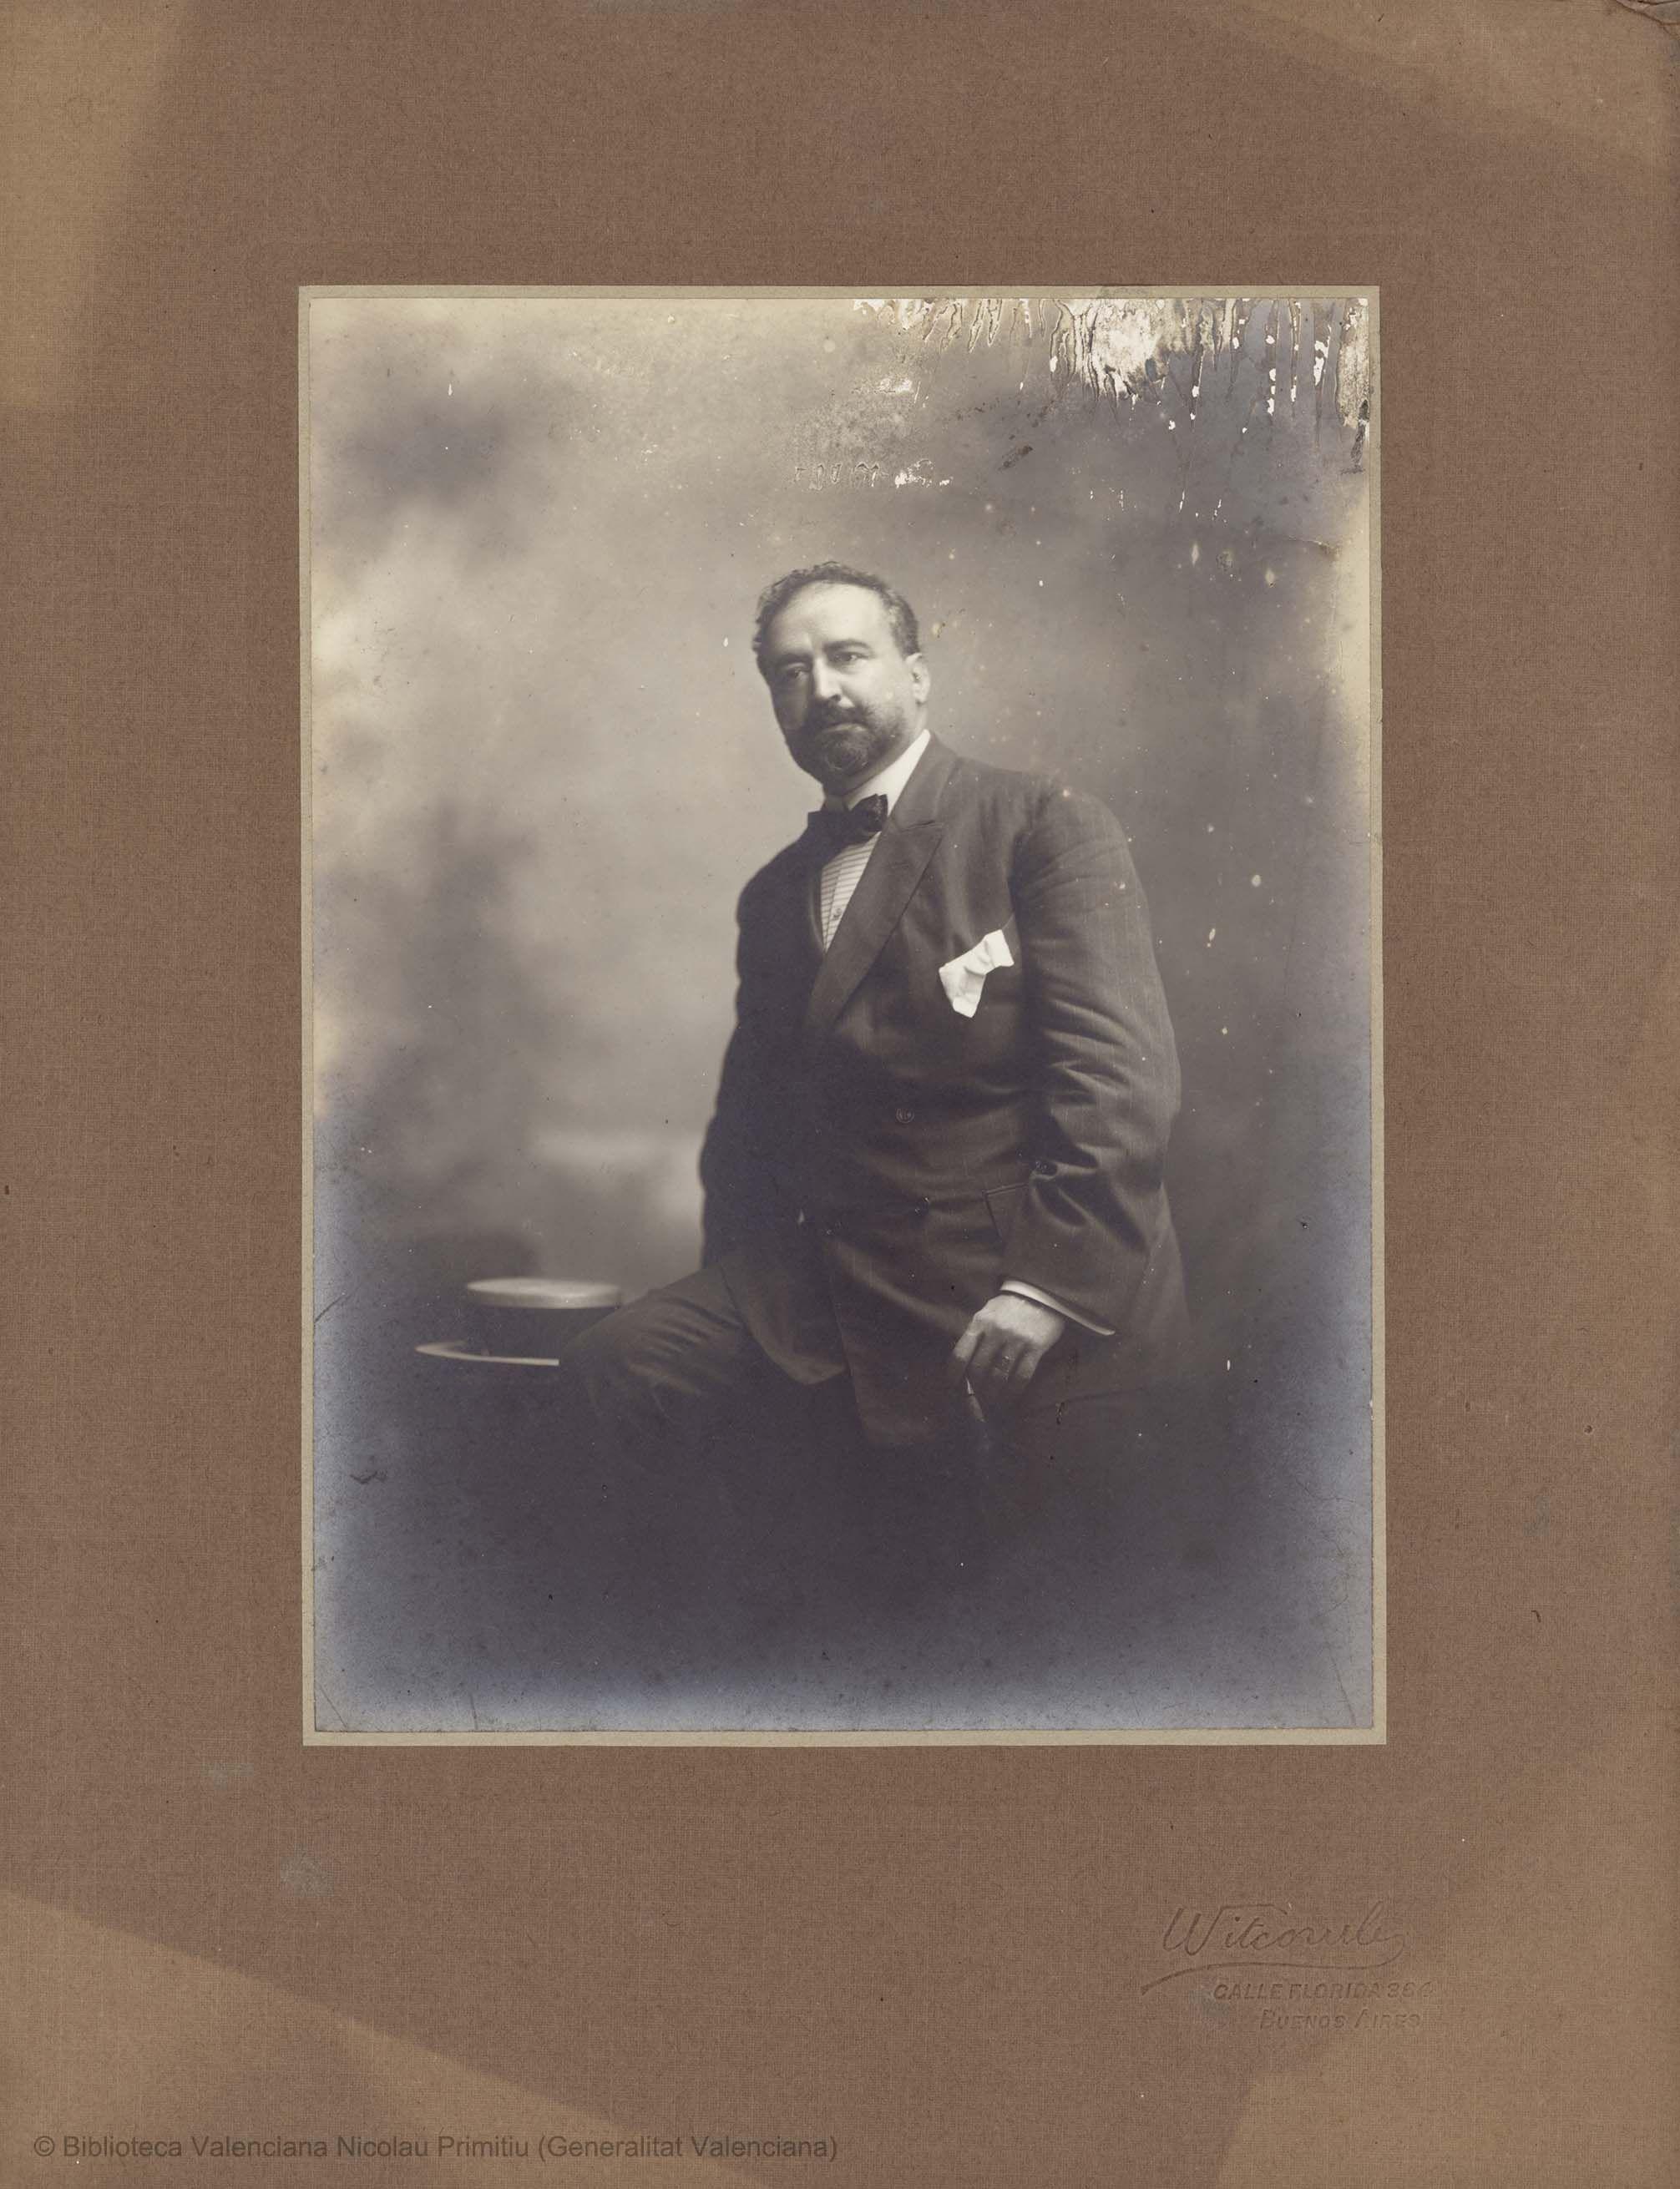 Retrato, de Witcomb. Buenos Aires, 1909, 22 x 16 cm, en h. de 34 x 26,5 cm  [Colección de material gráfico de Vicente Blasco Ibáñez]